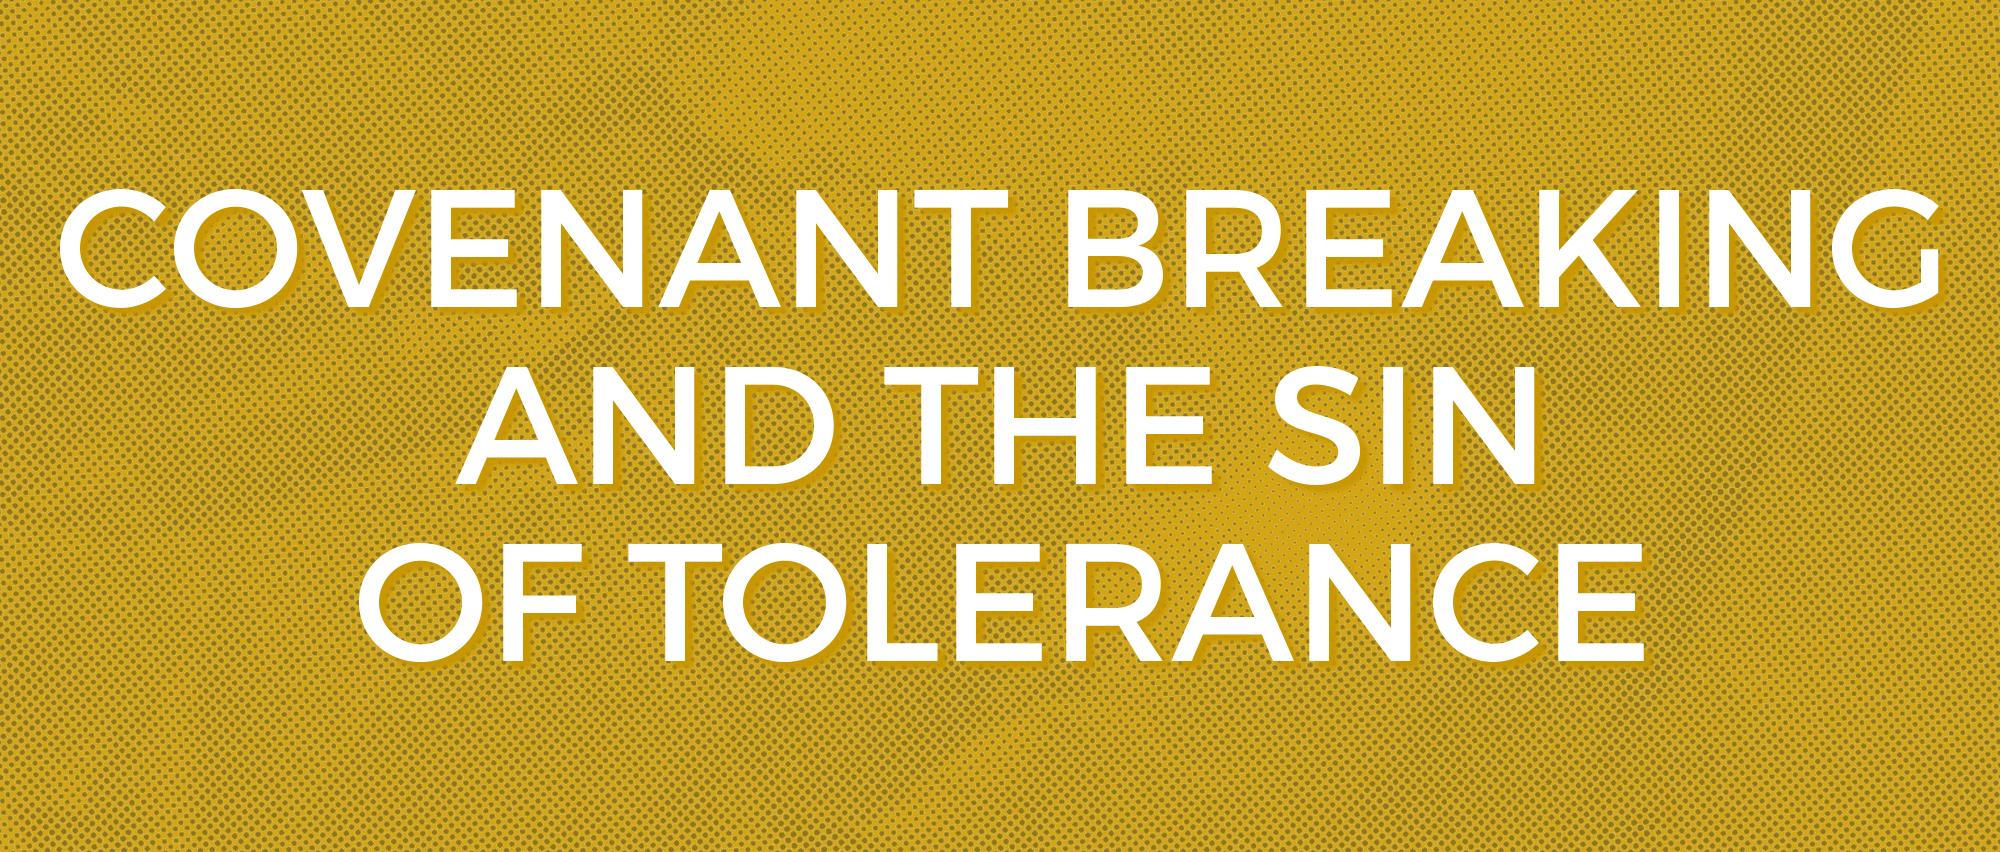 Covenant Breaking.jpg